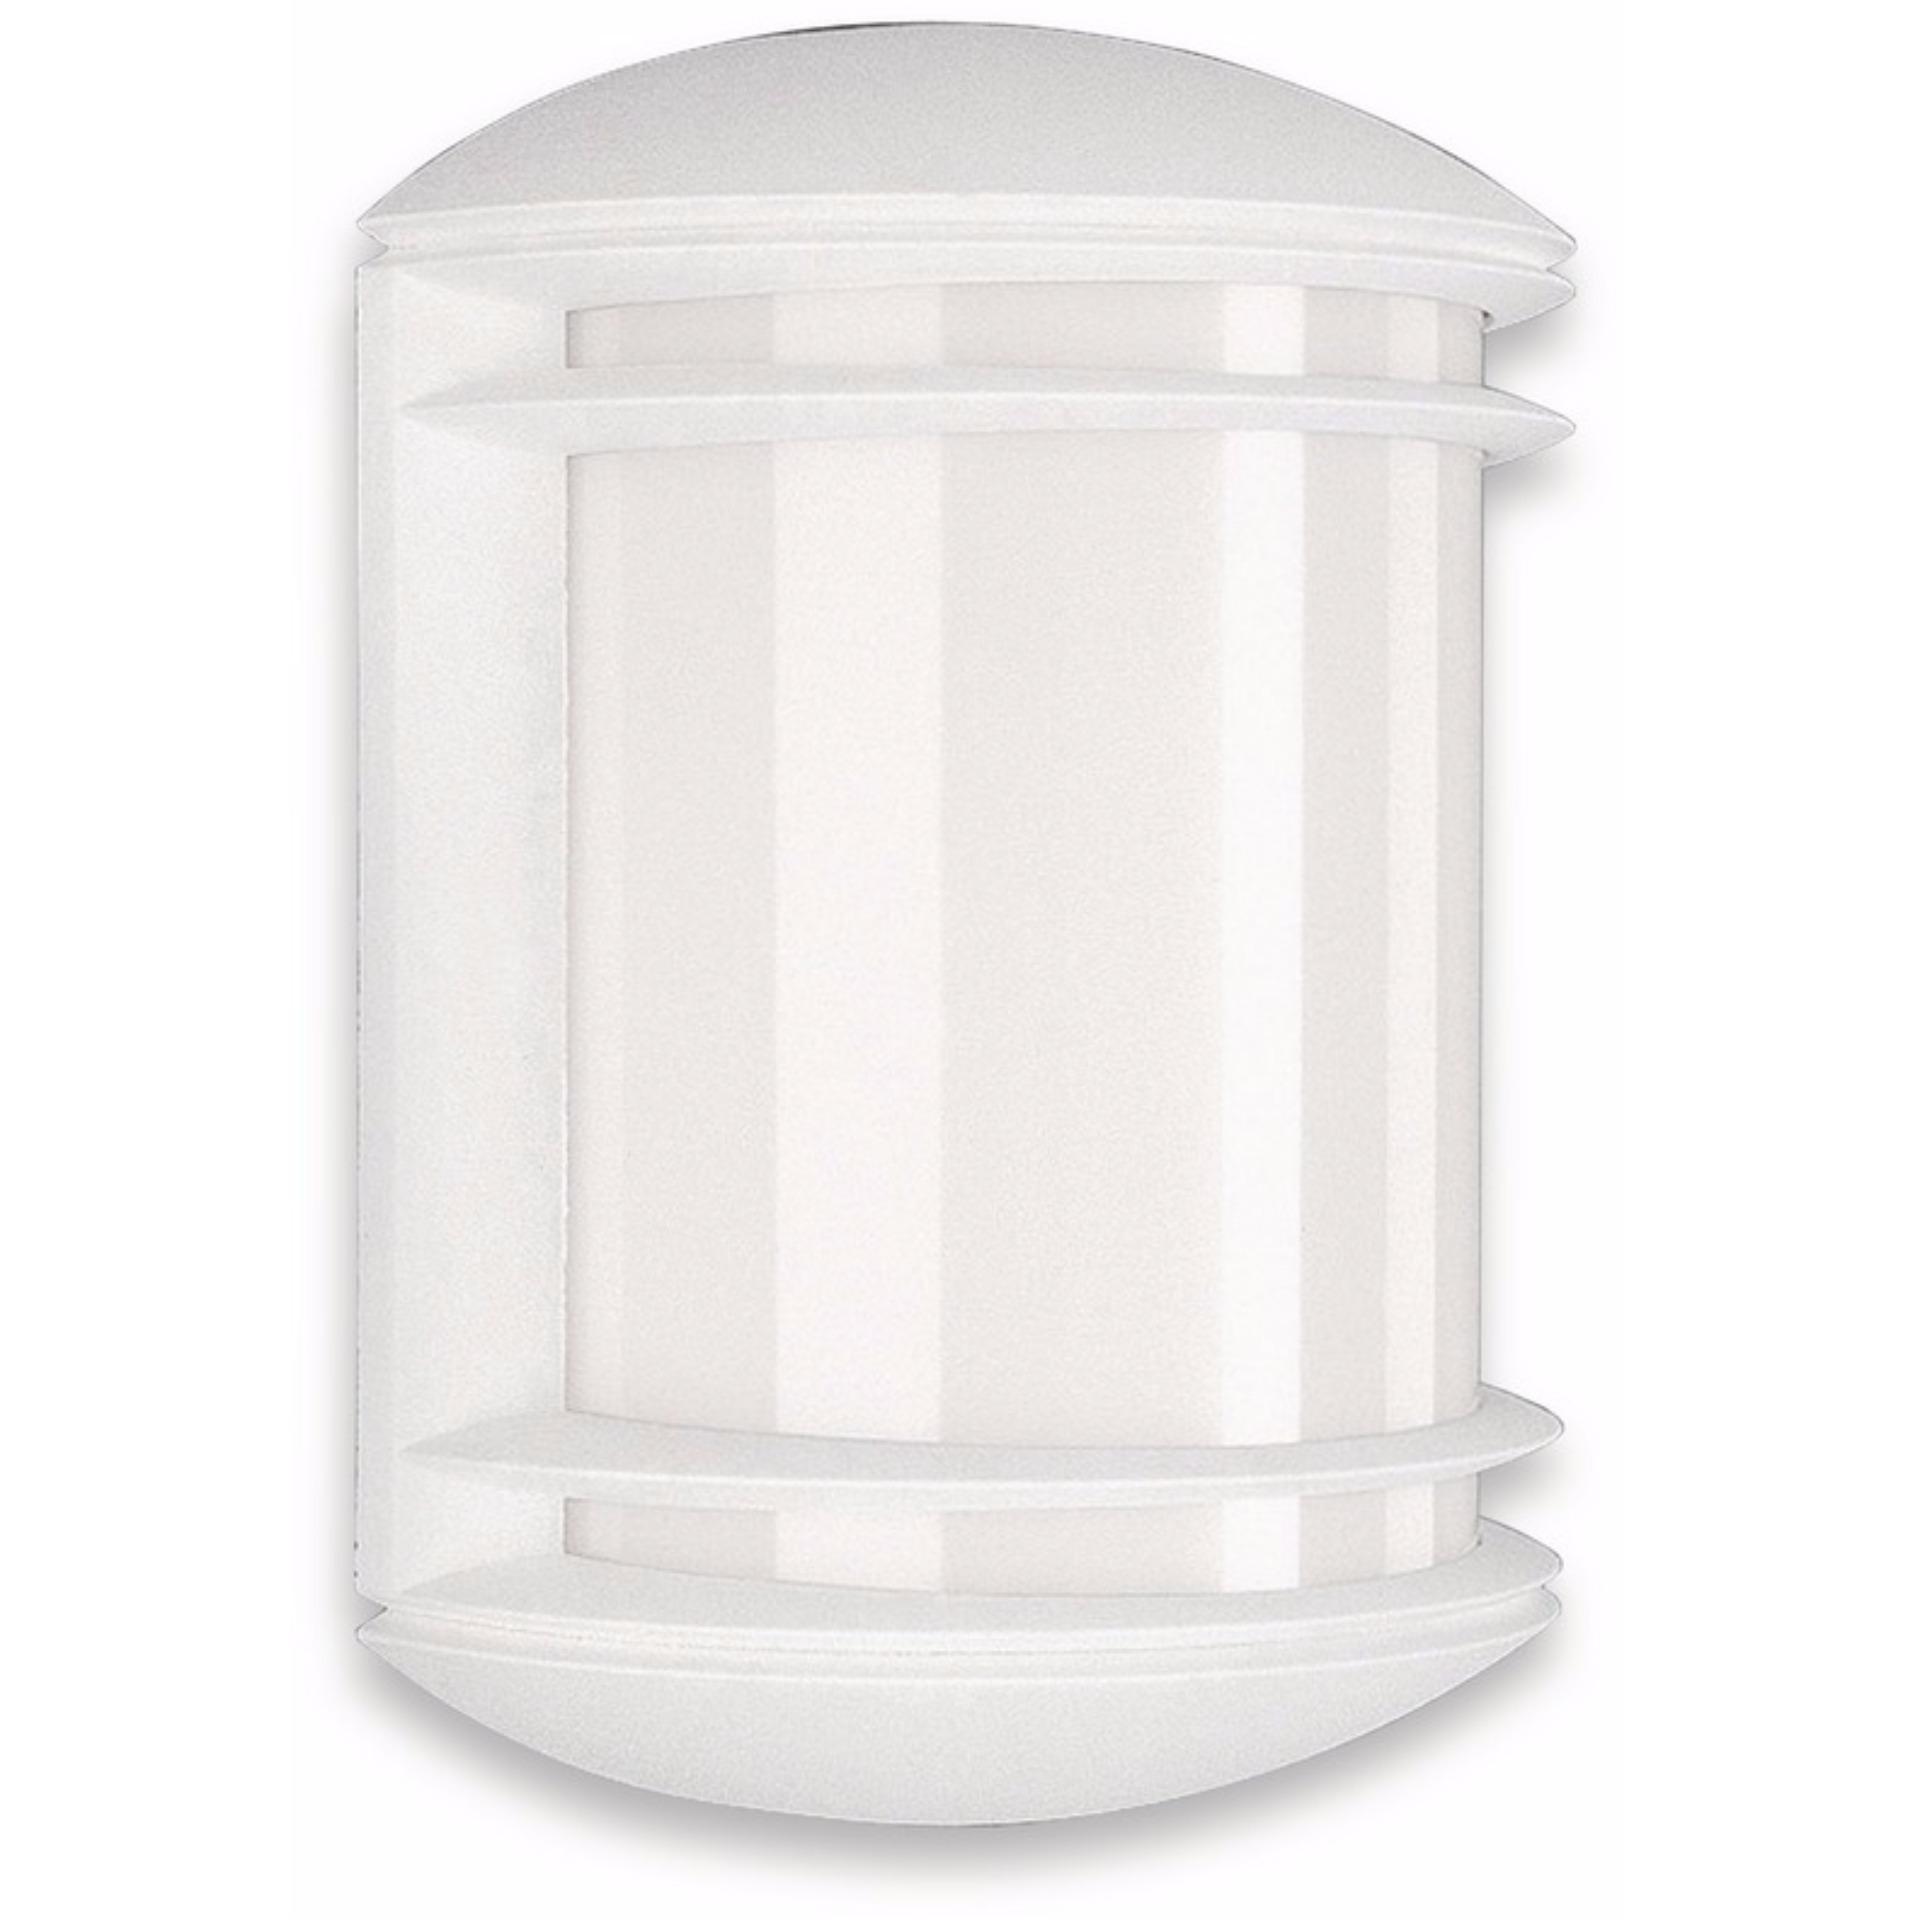 Philips Lampu Taman / Dinding - 01465 mygarden outdoor wall lantern white 1x60W 230V